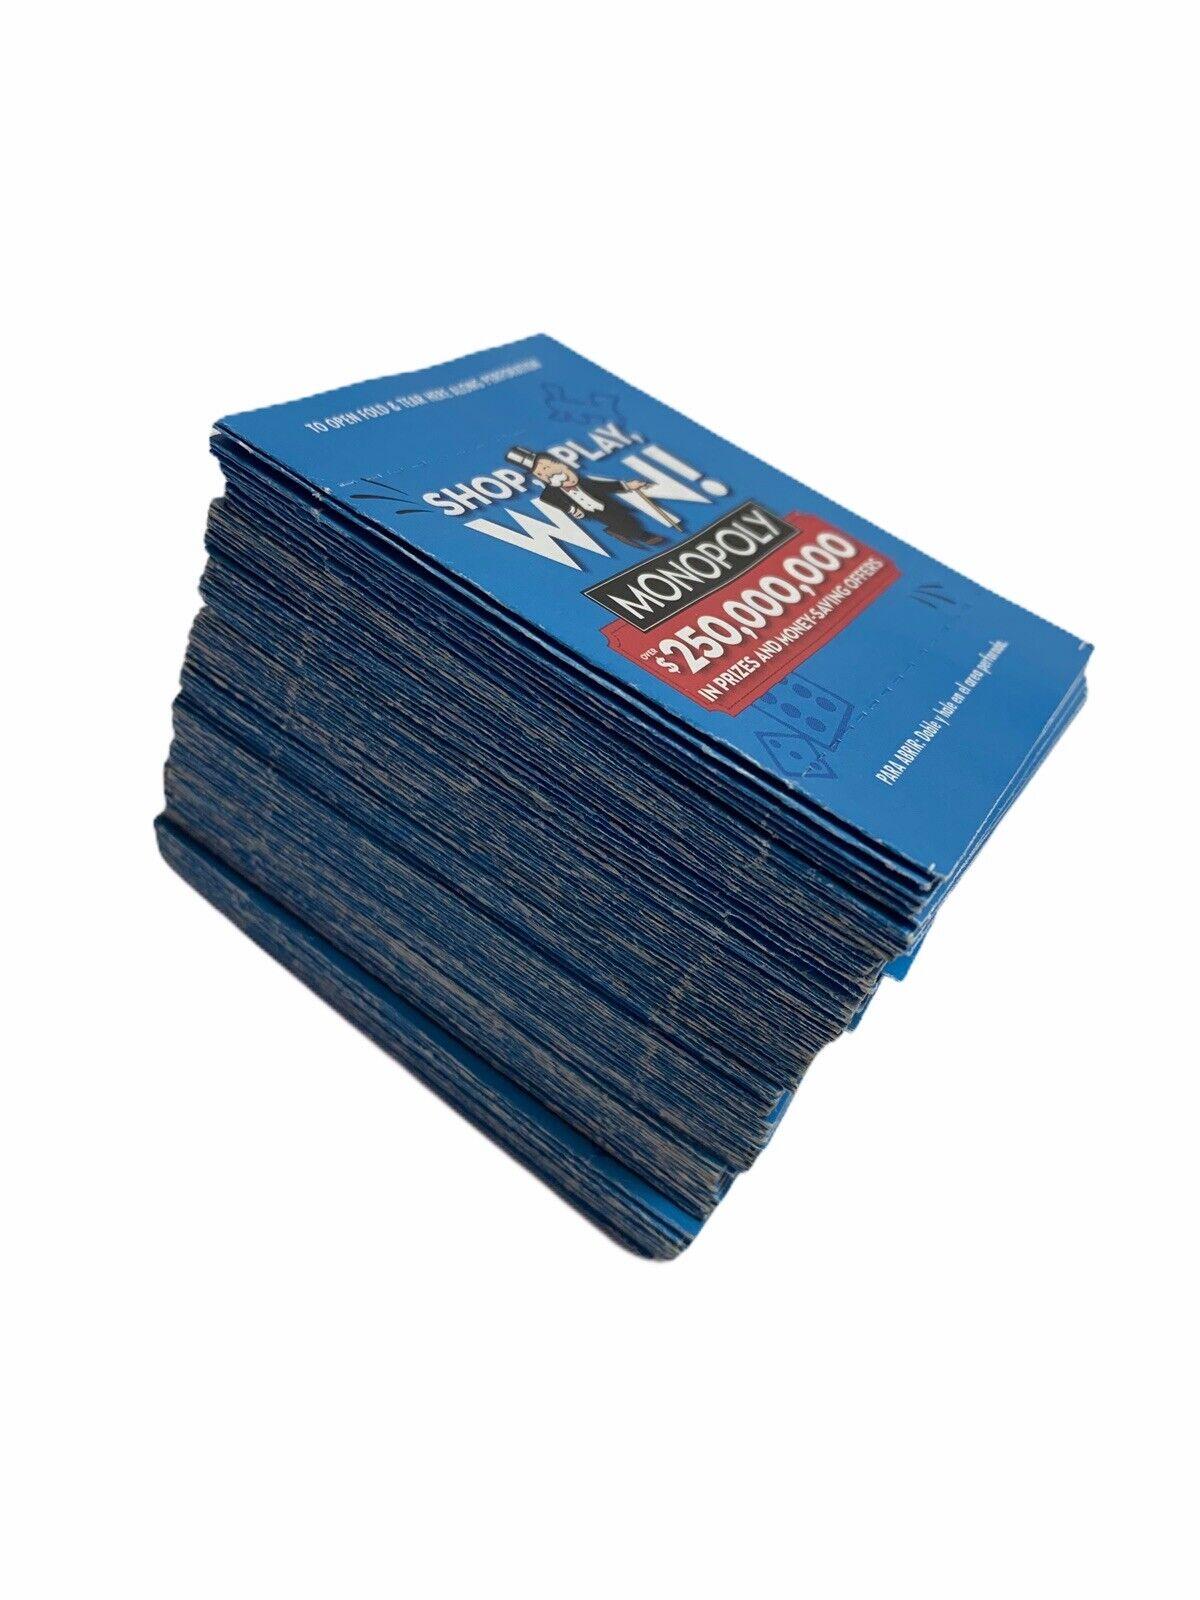 100 Monopoly Tickets Unopened Safeway Albertsons Vons 2017 For Sale Online Ebay